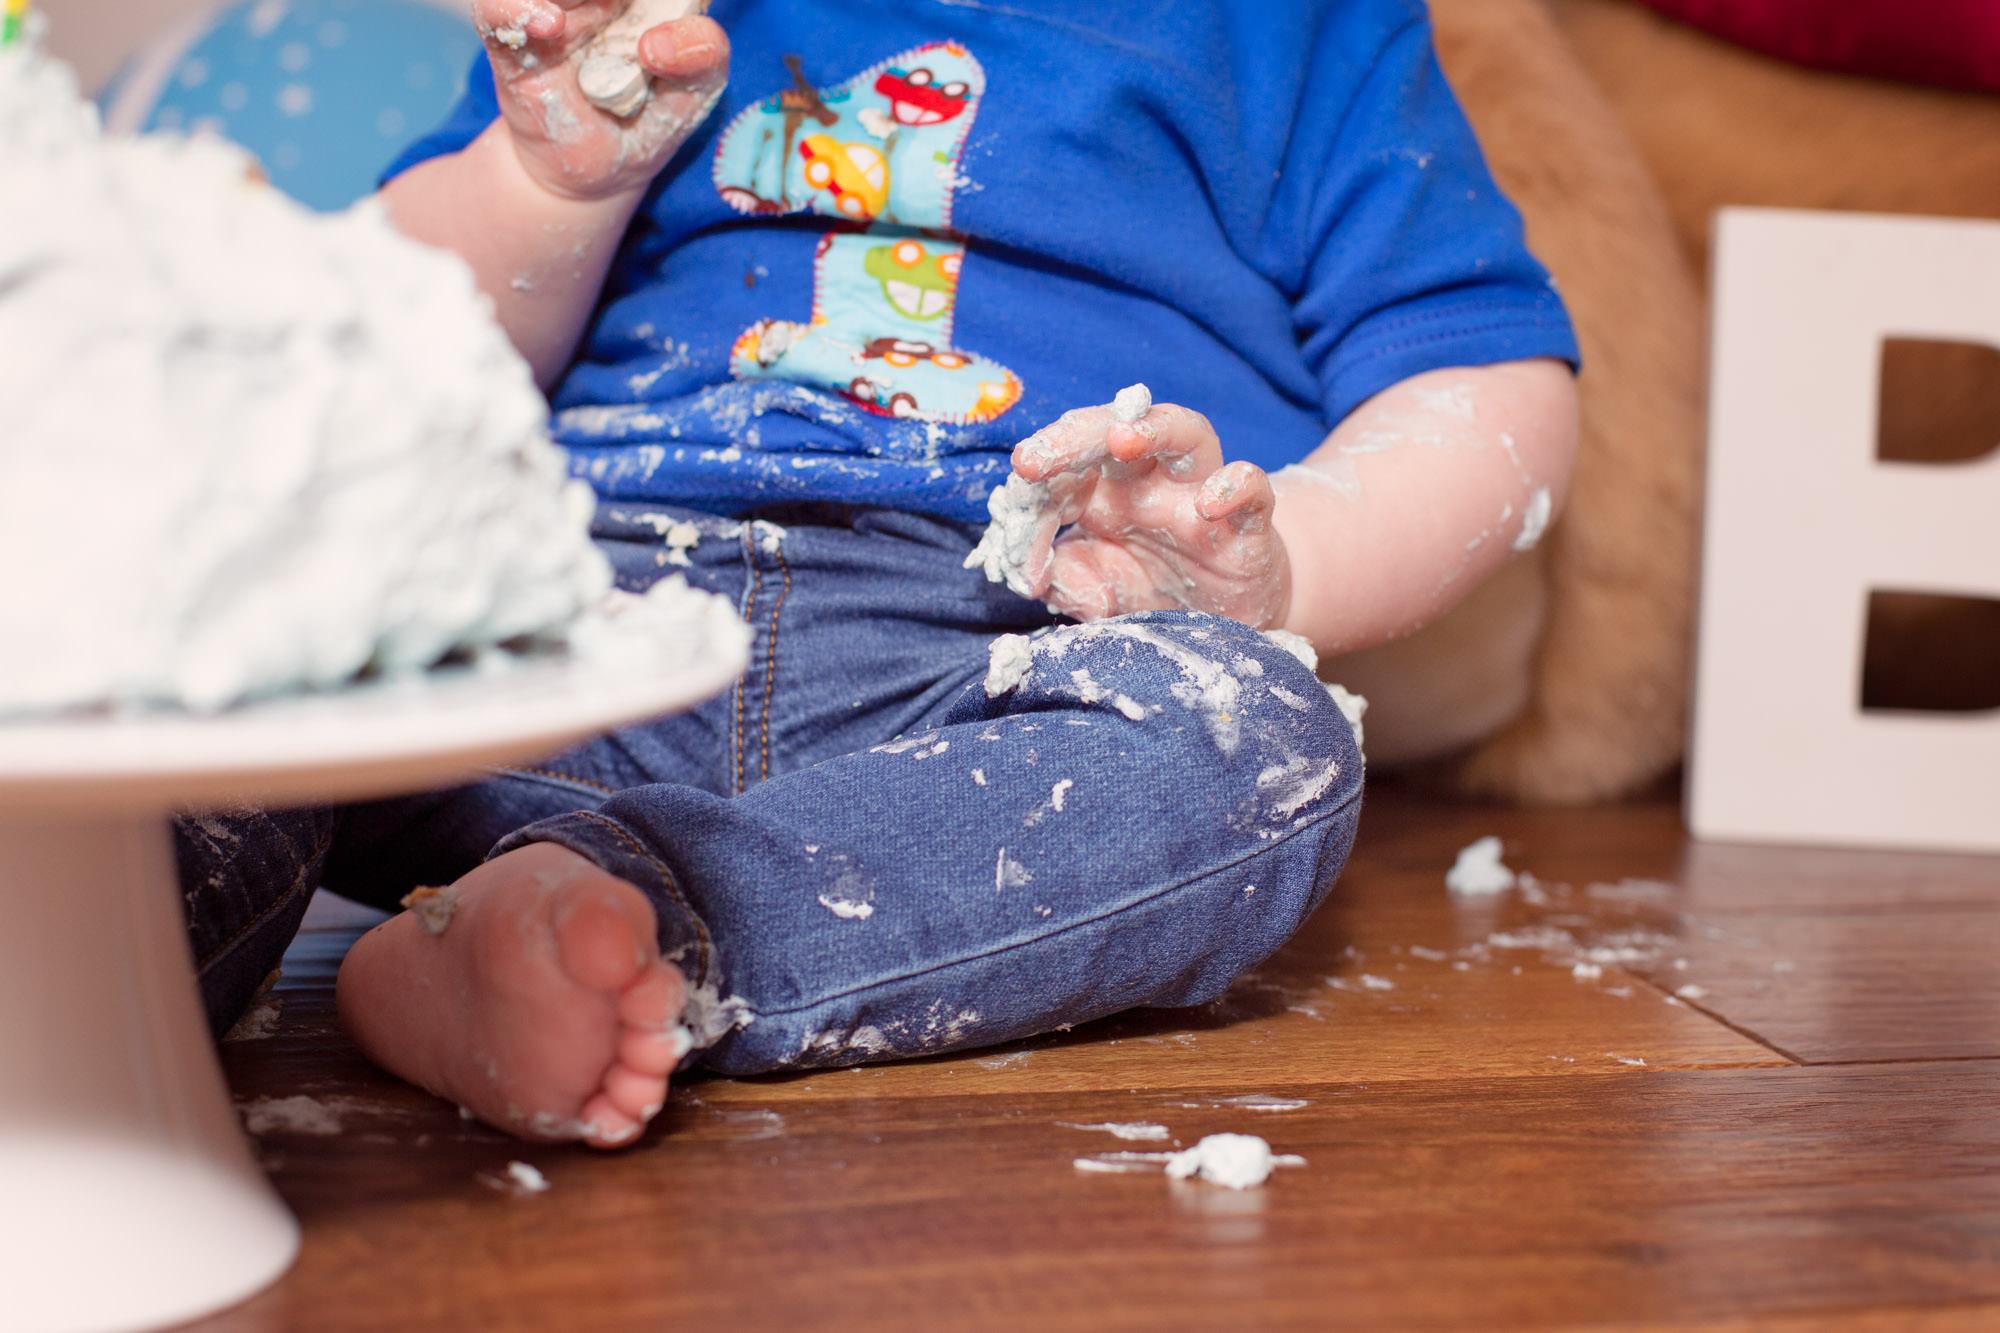 CAKE SMASH AT HOME BELFAST